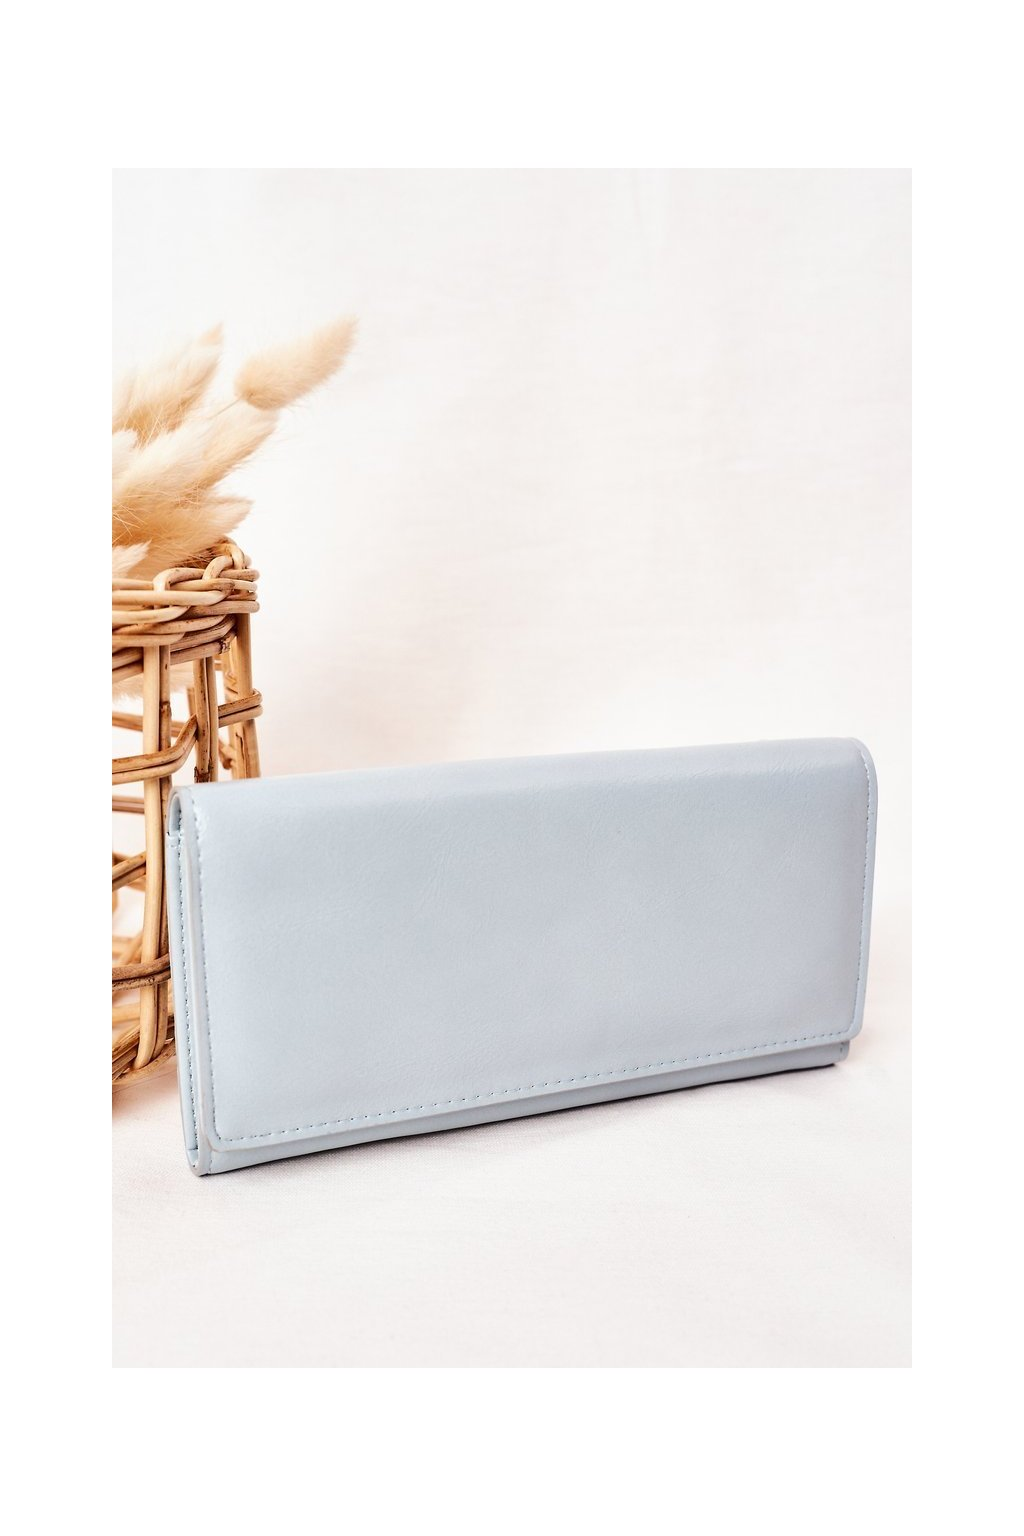 Peňaženka farba modrá kód AM-130 BŁĘKITNY